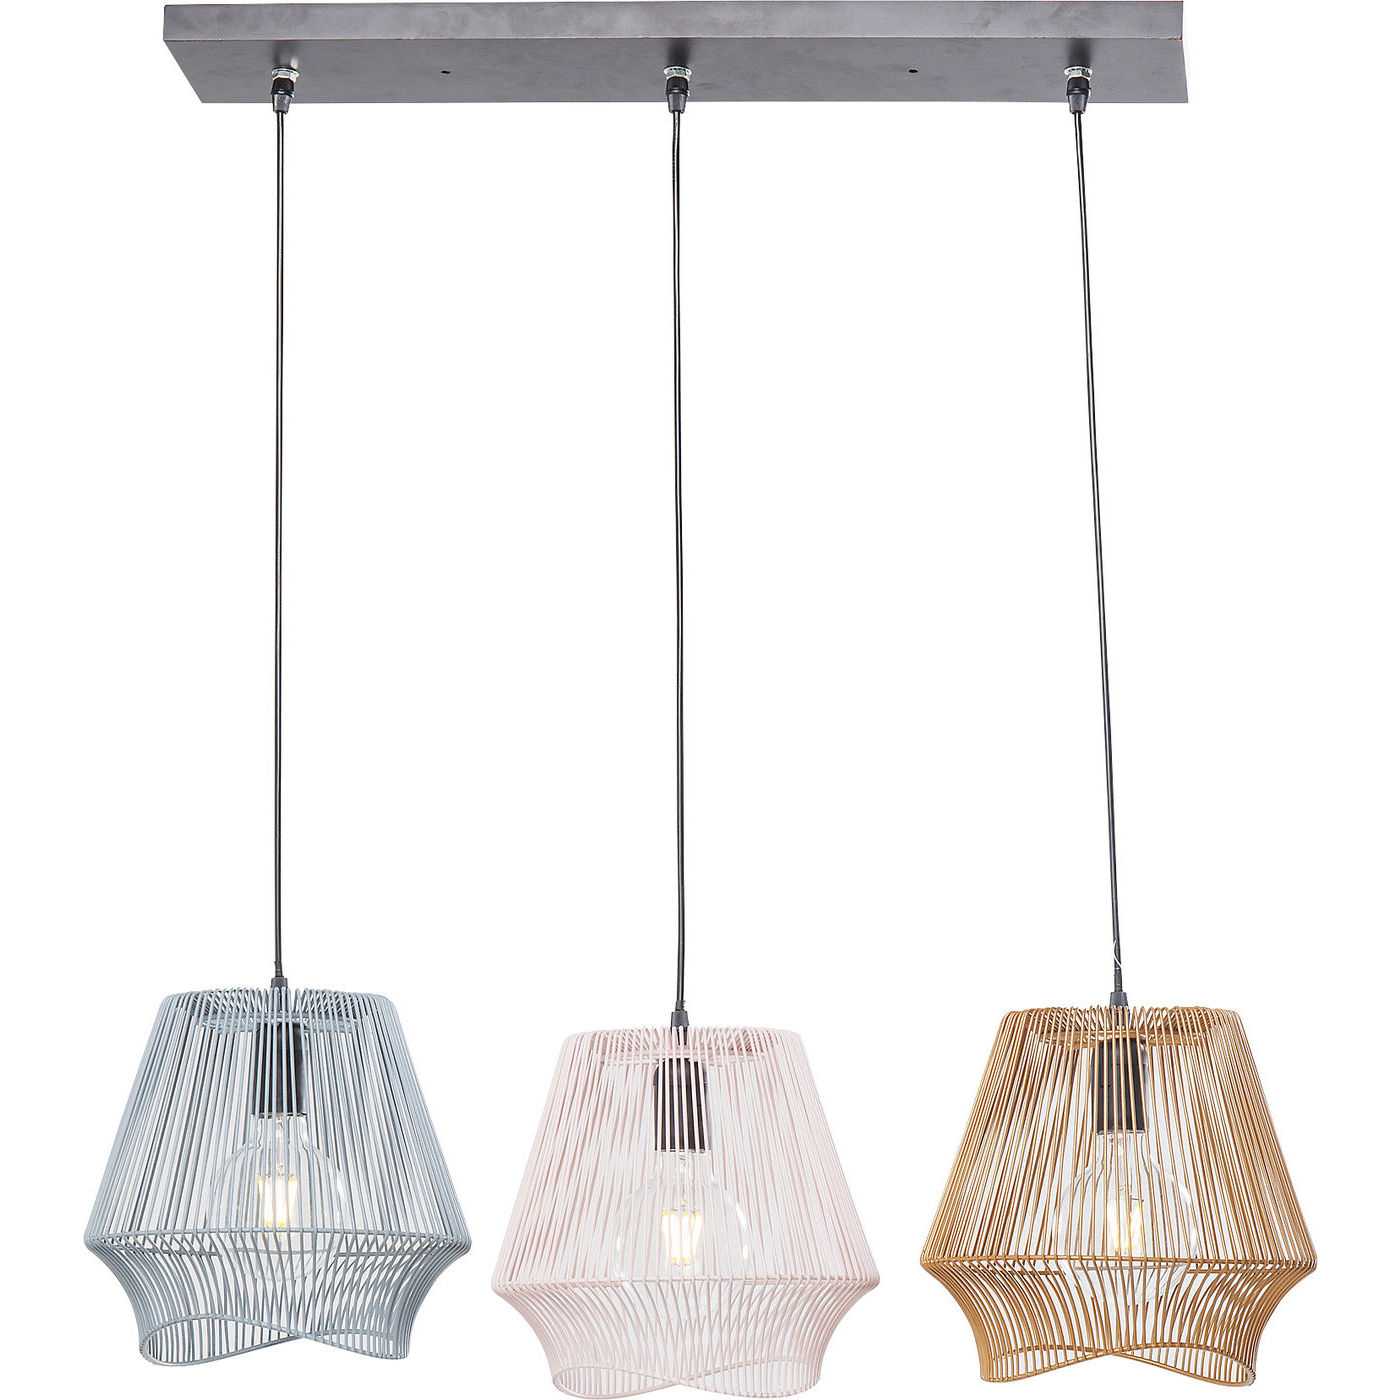 kare design – Kare design ischia dining tre loftlampe - grå/hvid/guld stål på boboonline.dk